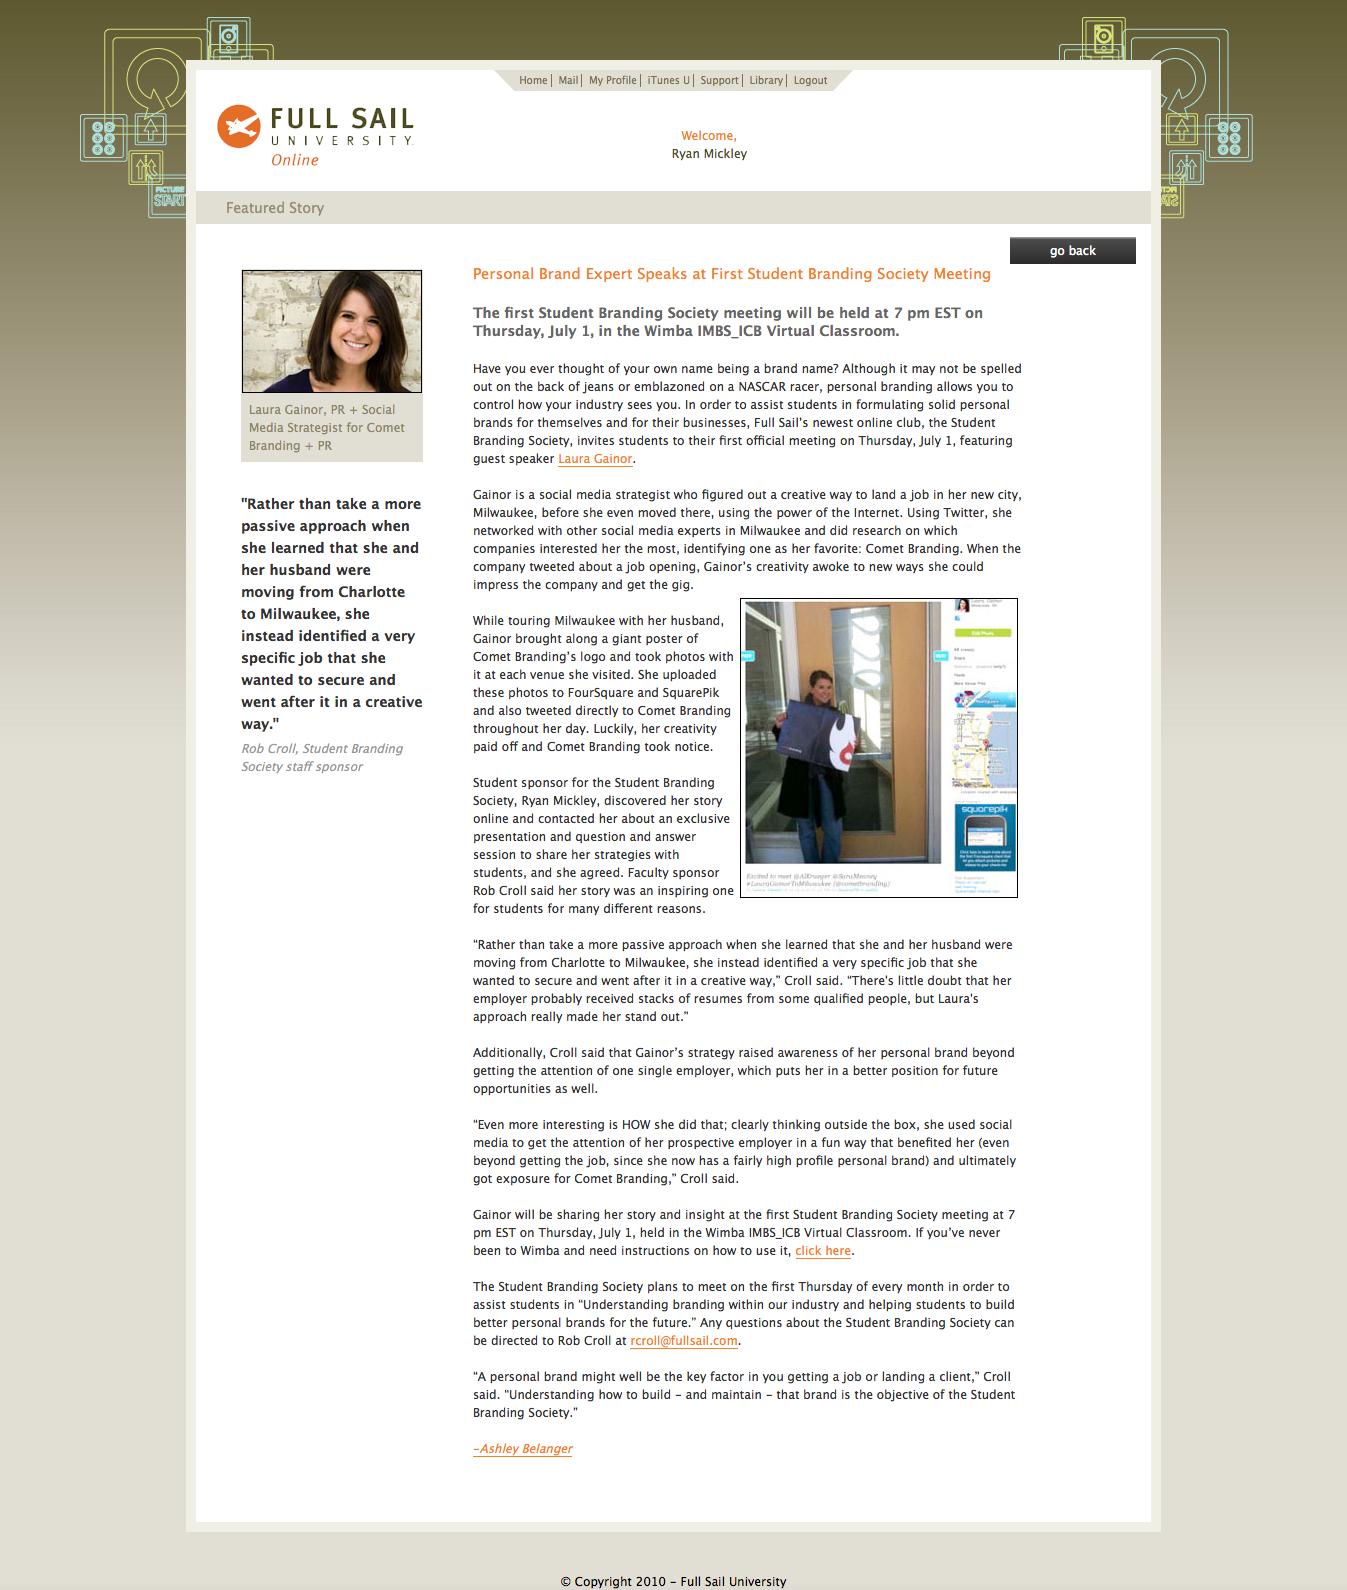 Presenting: Laura Gainor on Personal Branding for Full Sail University